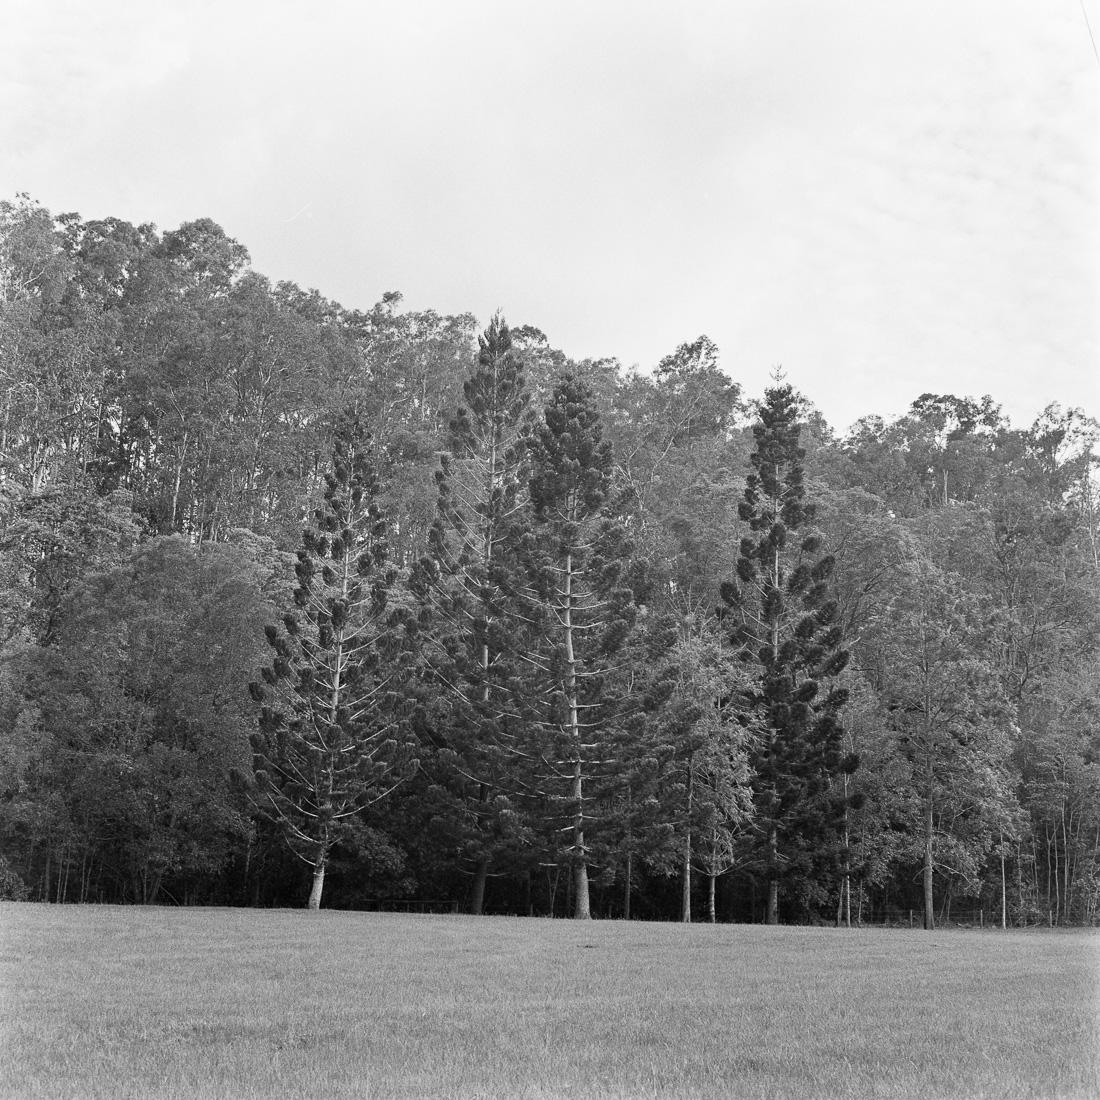 20190112 - Roll 270 - 003-Nick-Bedford,-Photographer-80mm F2.8, Black and White, Brisbane, Ilford HP5+, Medium Format, Rolleiflex 2.8D.jpg